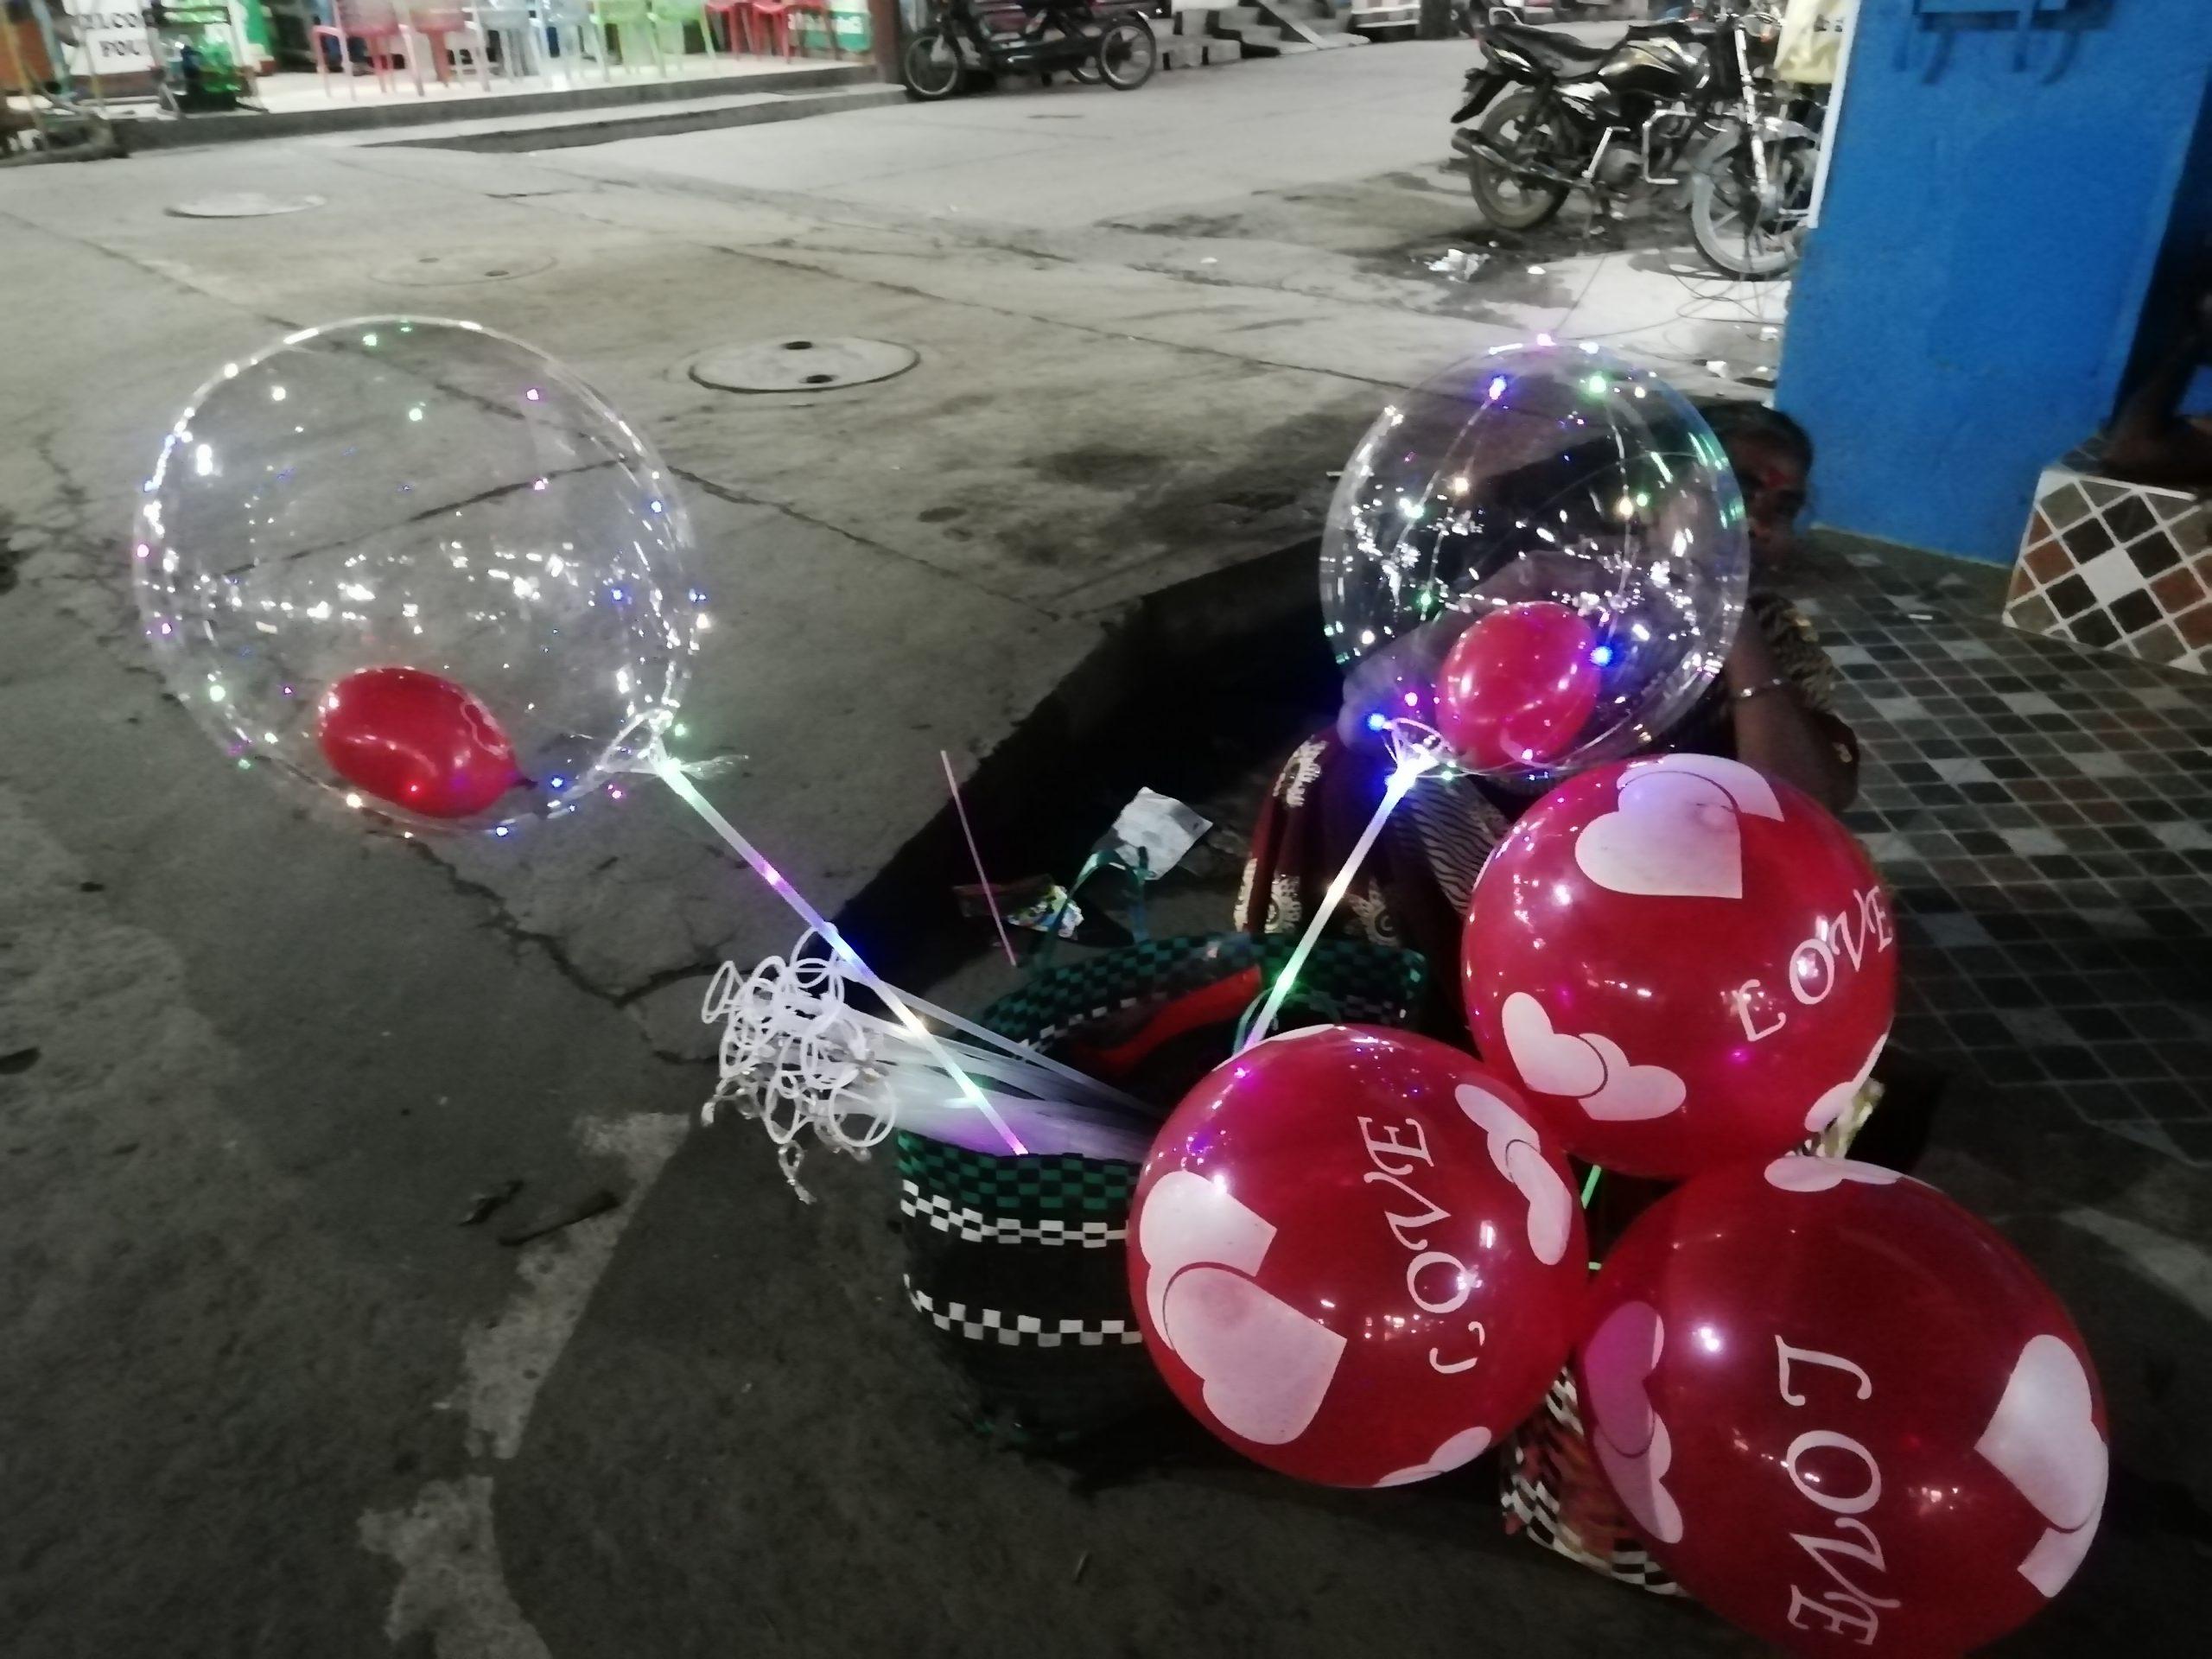 Designer balloon